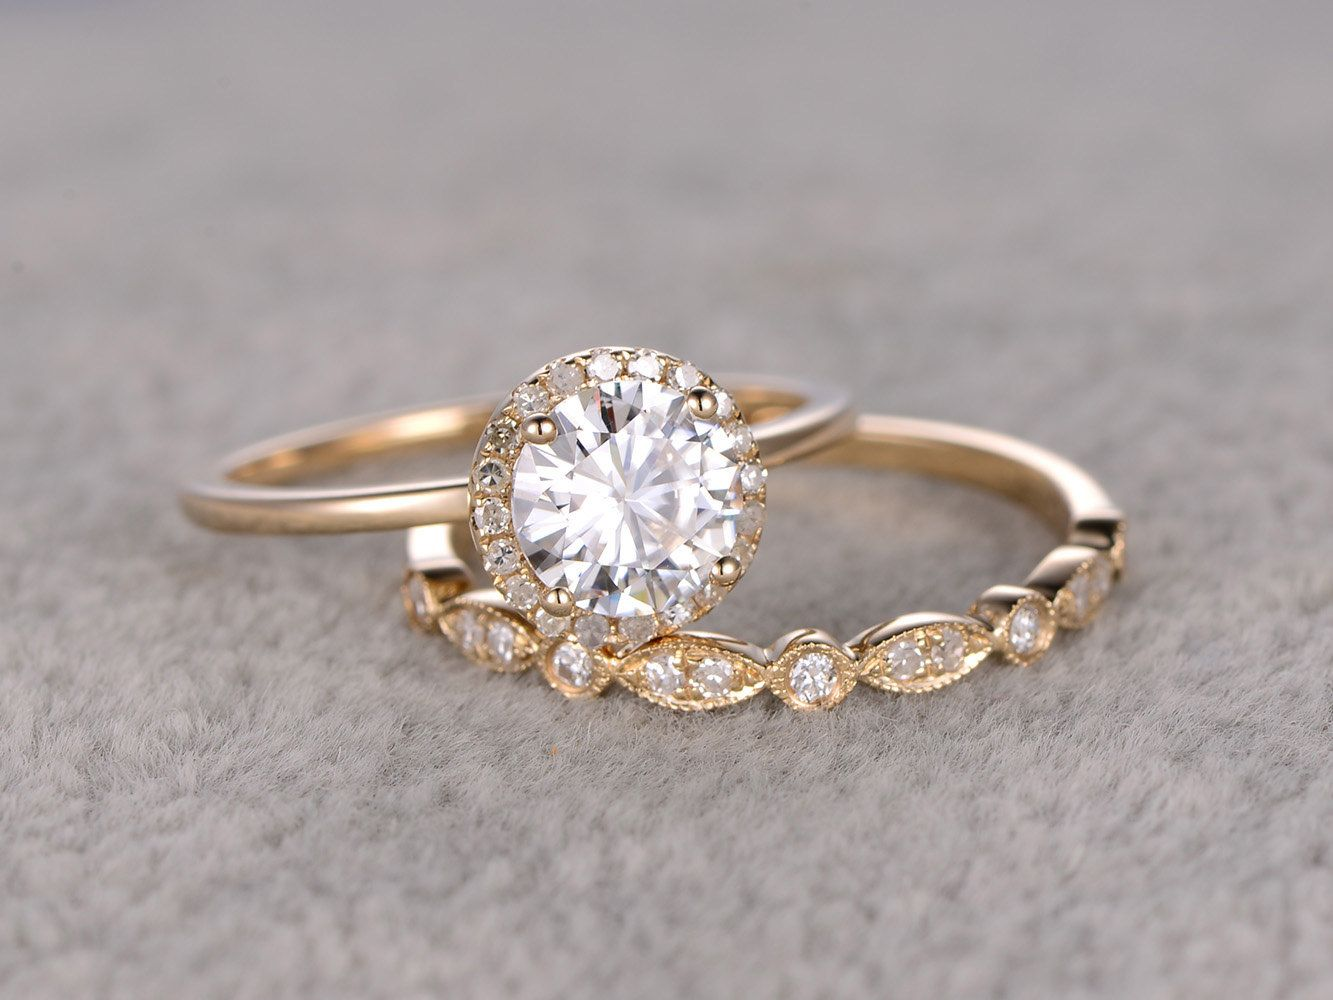 2pcs 1ct Moissanite Bridal Ring SetEngagement ring Yellow Plain